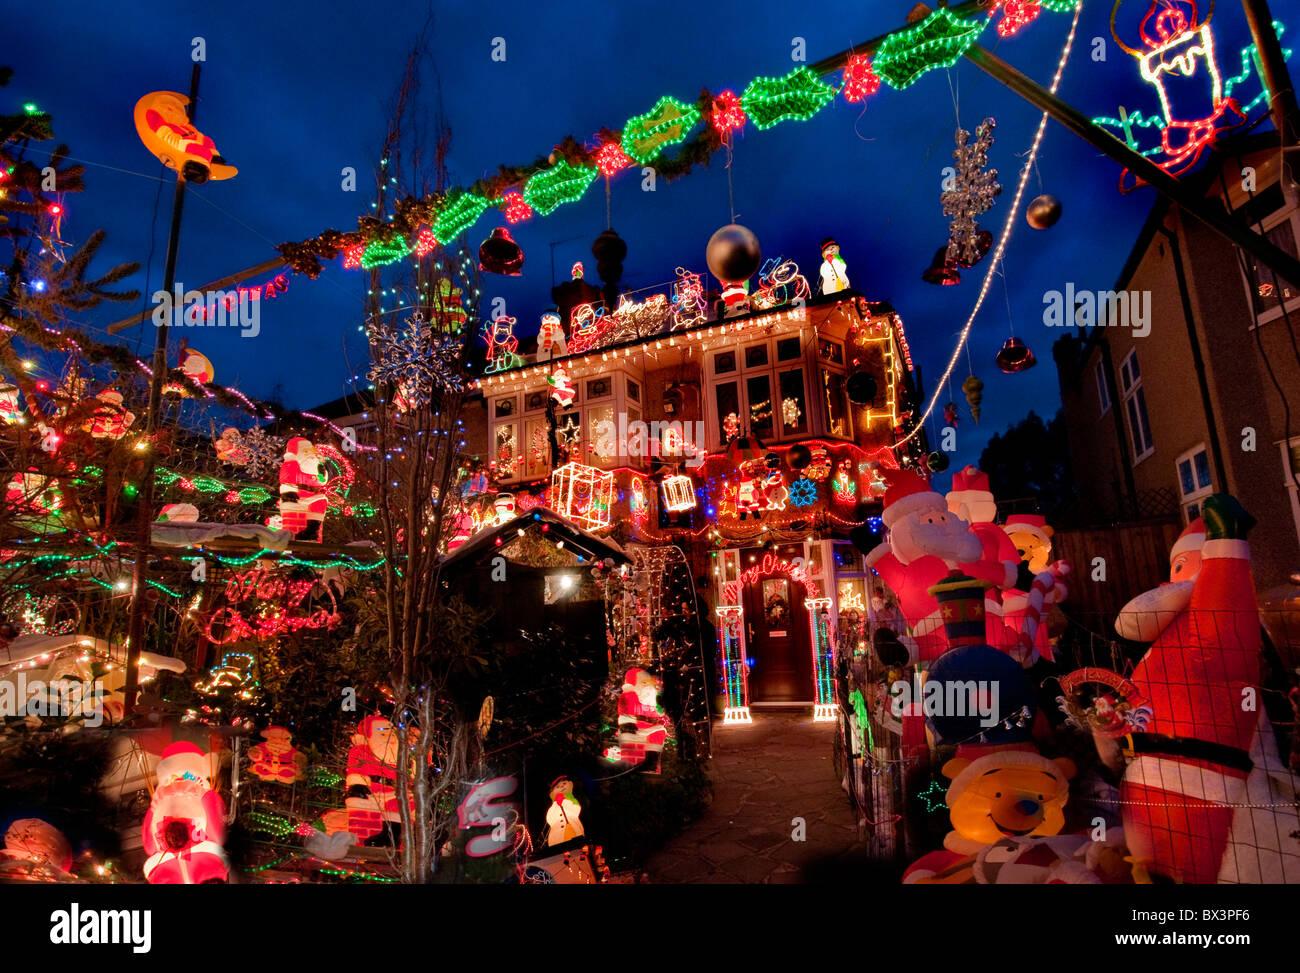 Natale è alle porte e tra poco vedremo nelle nostre città luci natalizie nelle vie commerciali, … Christmas Decorations House Exterior High Resolution Stock Photography And Images Alamy